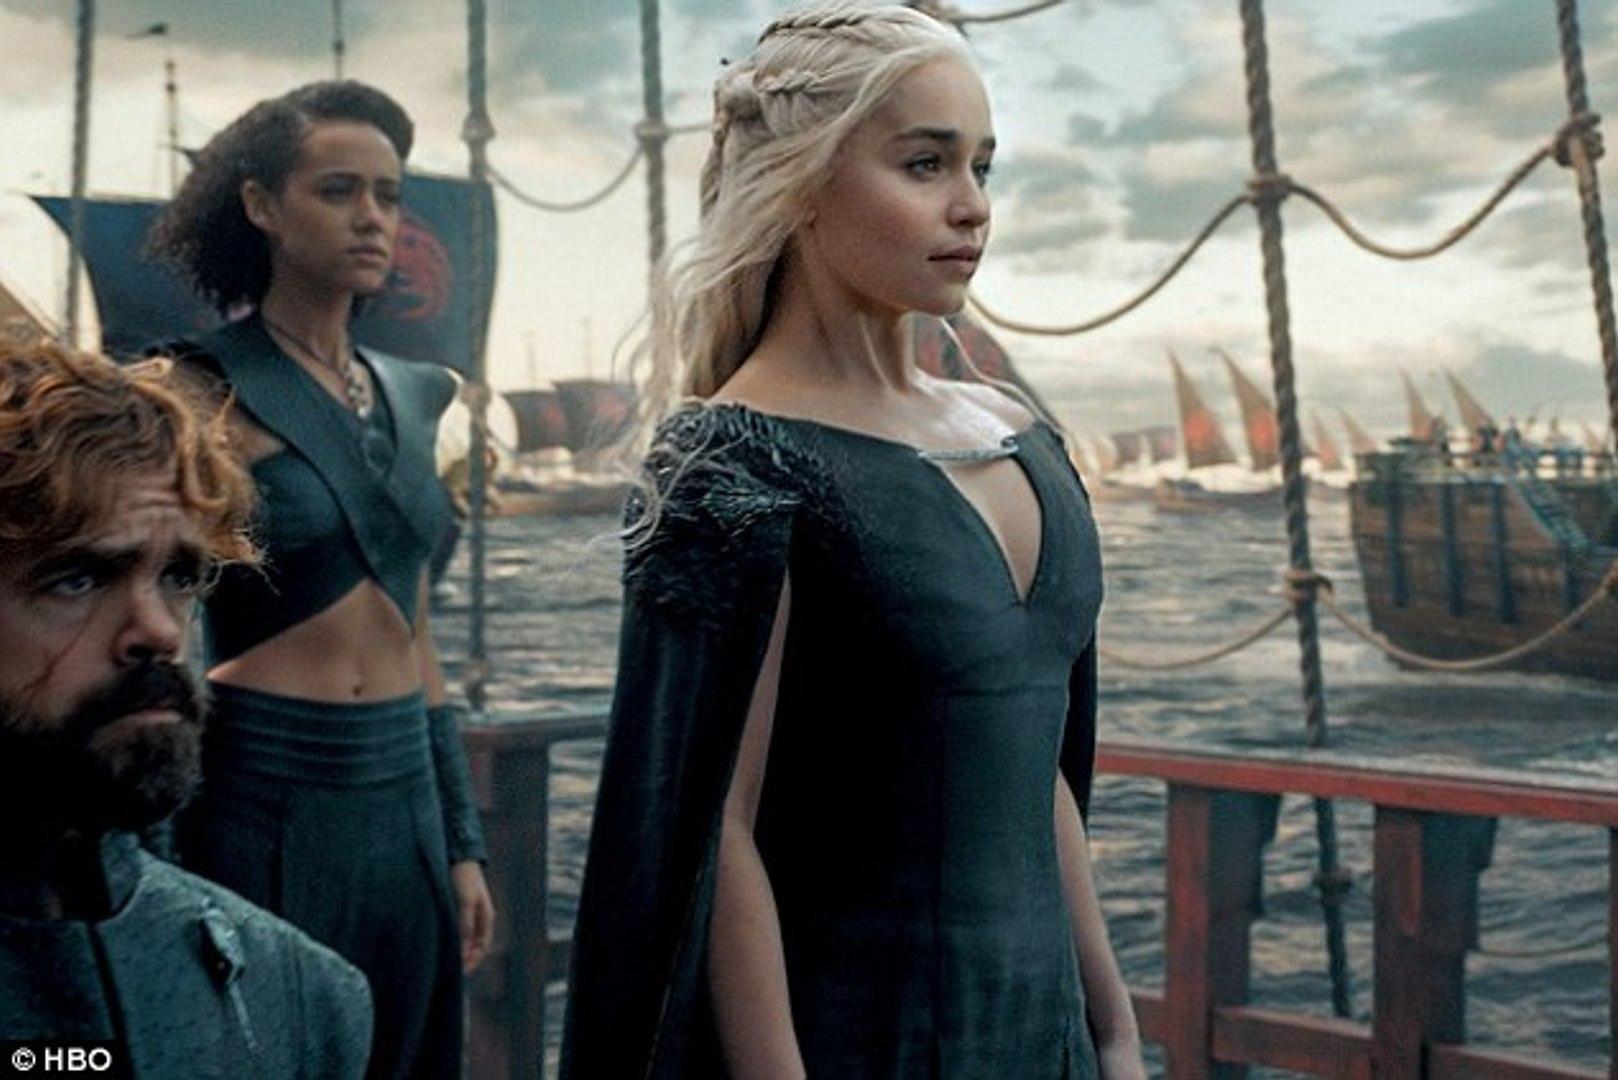 Season 7 Episode 7 Leaked Scenes ! - Game of Thrones Season 7 Episode 7 (S07E7)